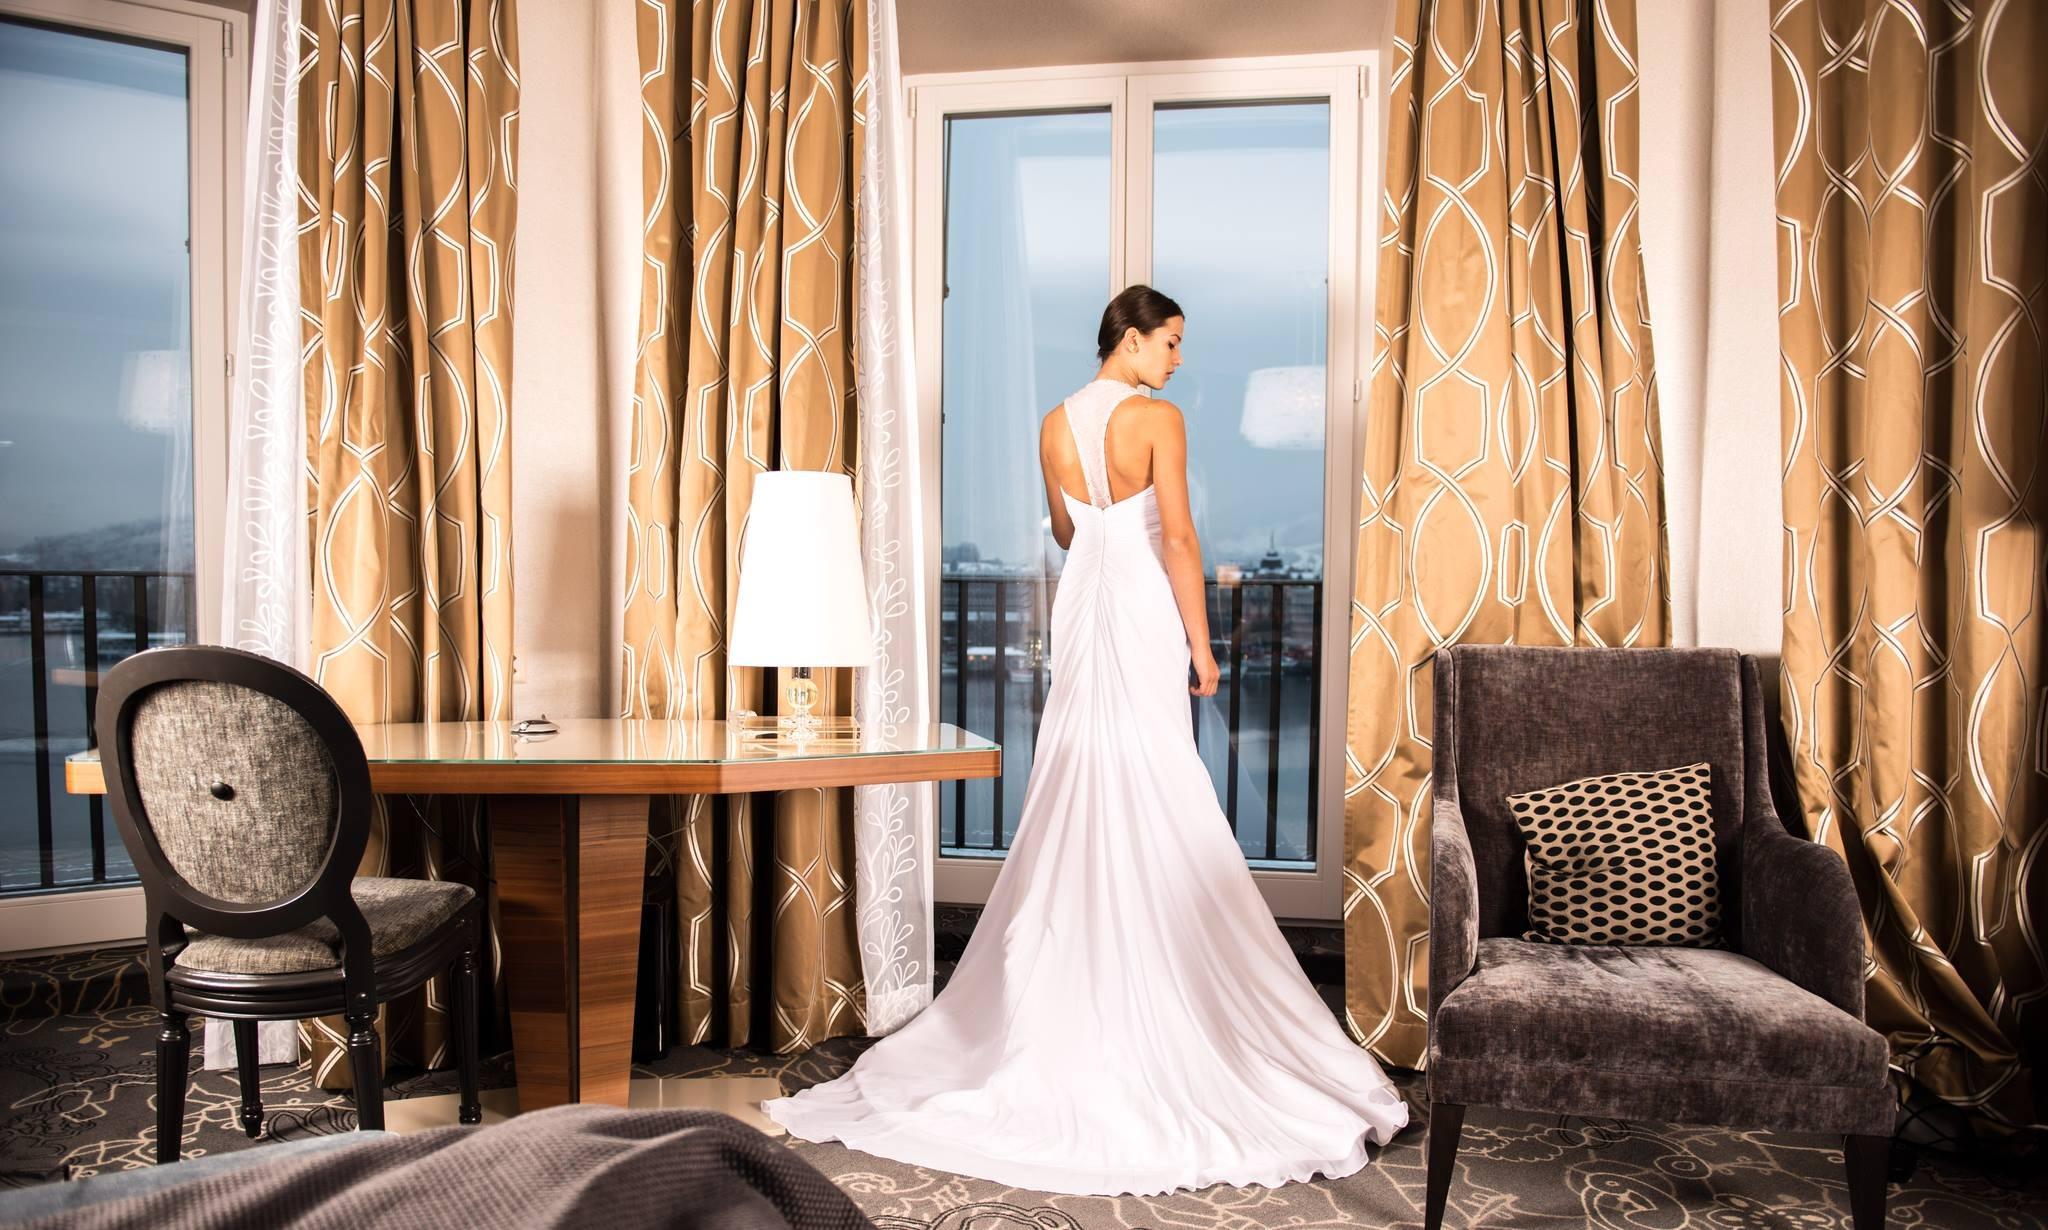 WEDDING PHOTO & VIDEO $1799 - 1 PHOTOGRAPHER/ 1 VIDEOGRAPHER/ 5 HOURS